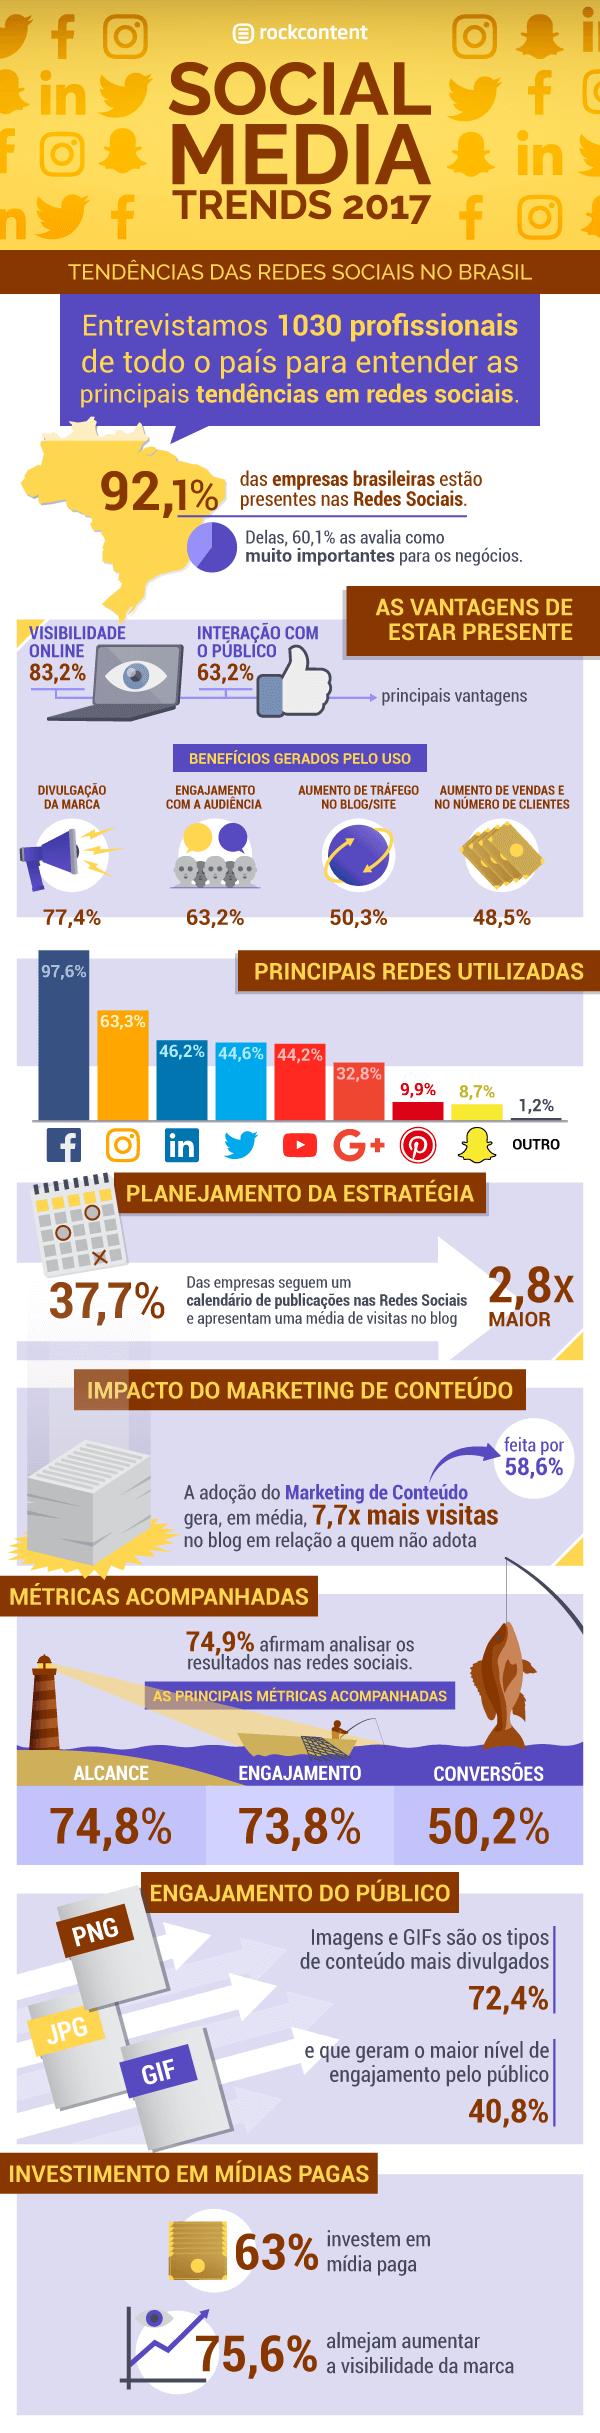 social media trends 2017 infográfico